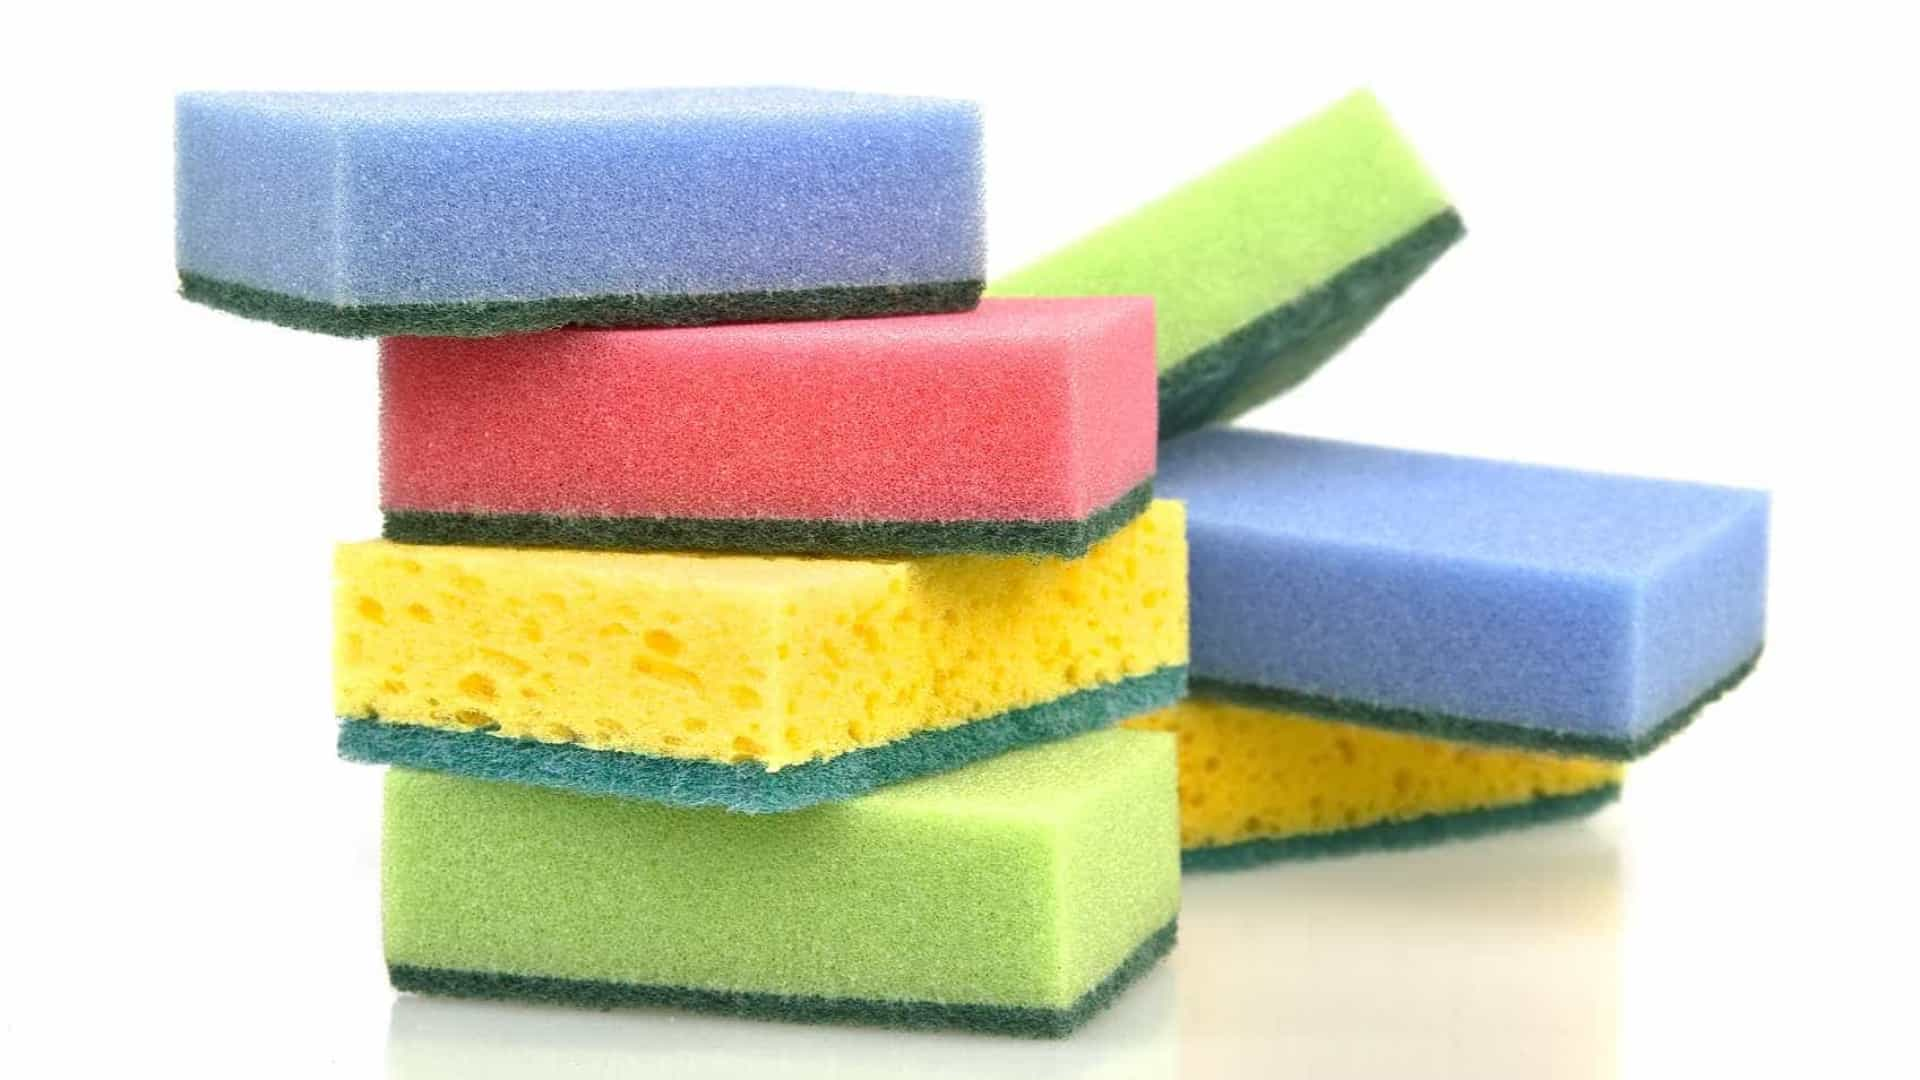 Aprenda 3 formas diferentes de limpar a esponja de lavar louça